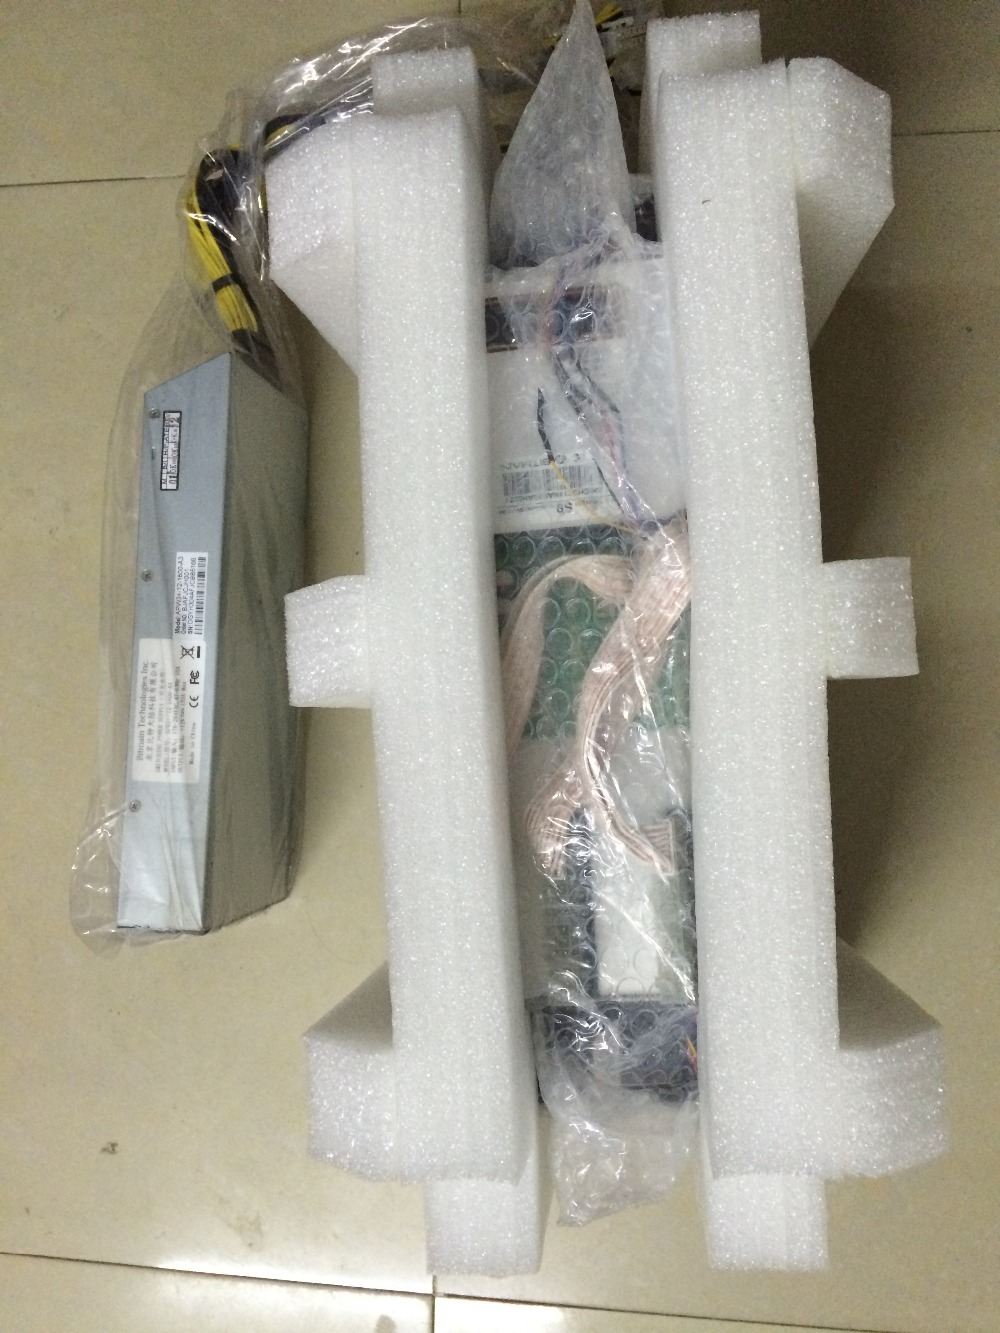 Новый AntMiner T9 два вентилятора 10.5Th/s с БП T9 Шахтер Asic шахтер Bitcon Шахтер 16nm БТД горной же как BITMAIN AntMiner s9